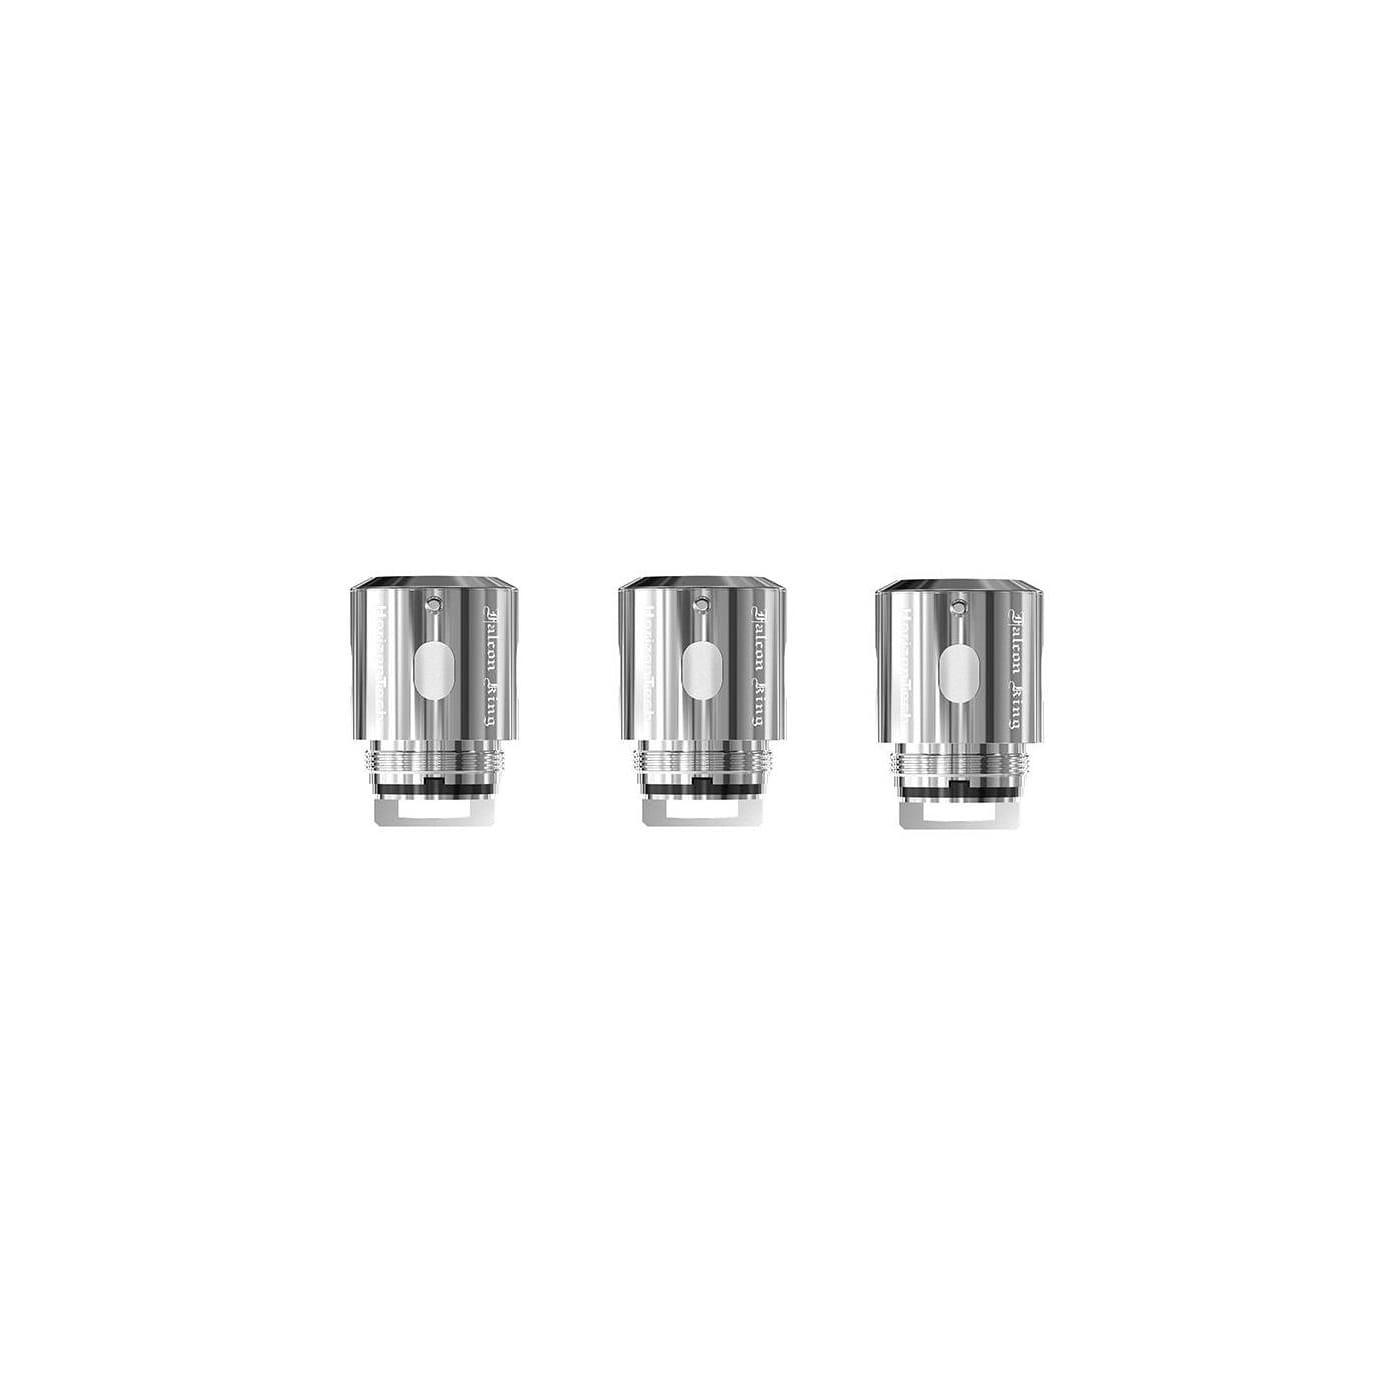 Horizon M-Dual Mesh Replacement Coils - 3 Pack